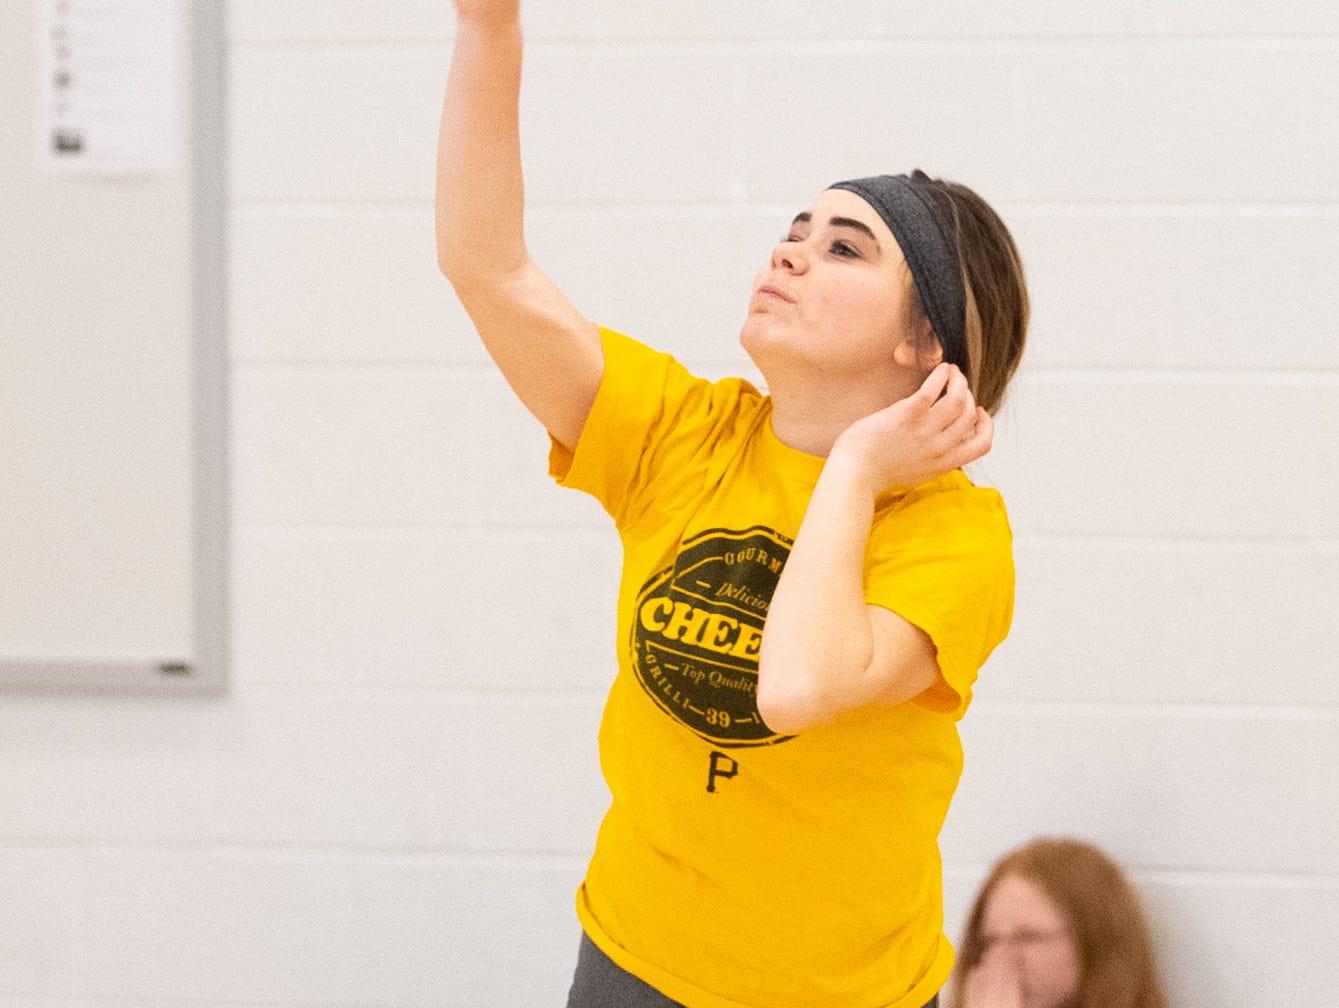 West York's girls' volleyball team works to improve their fundamentals, March 5, 2019.